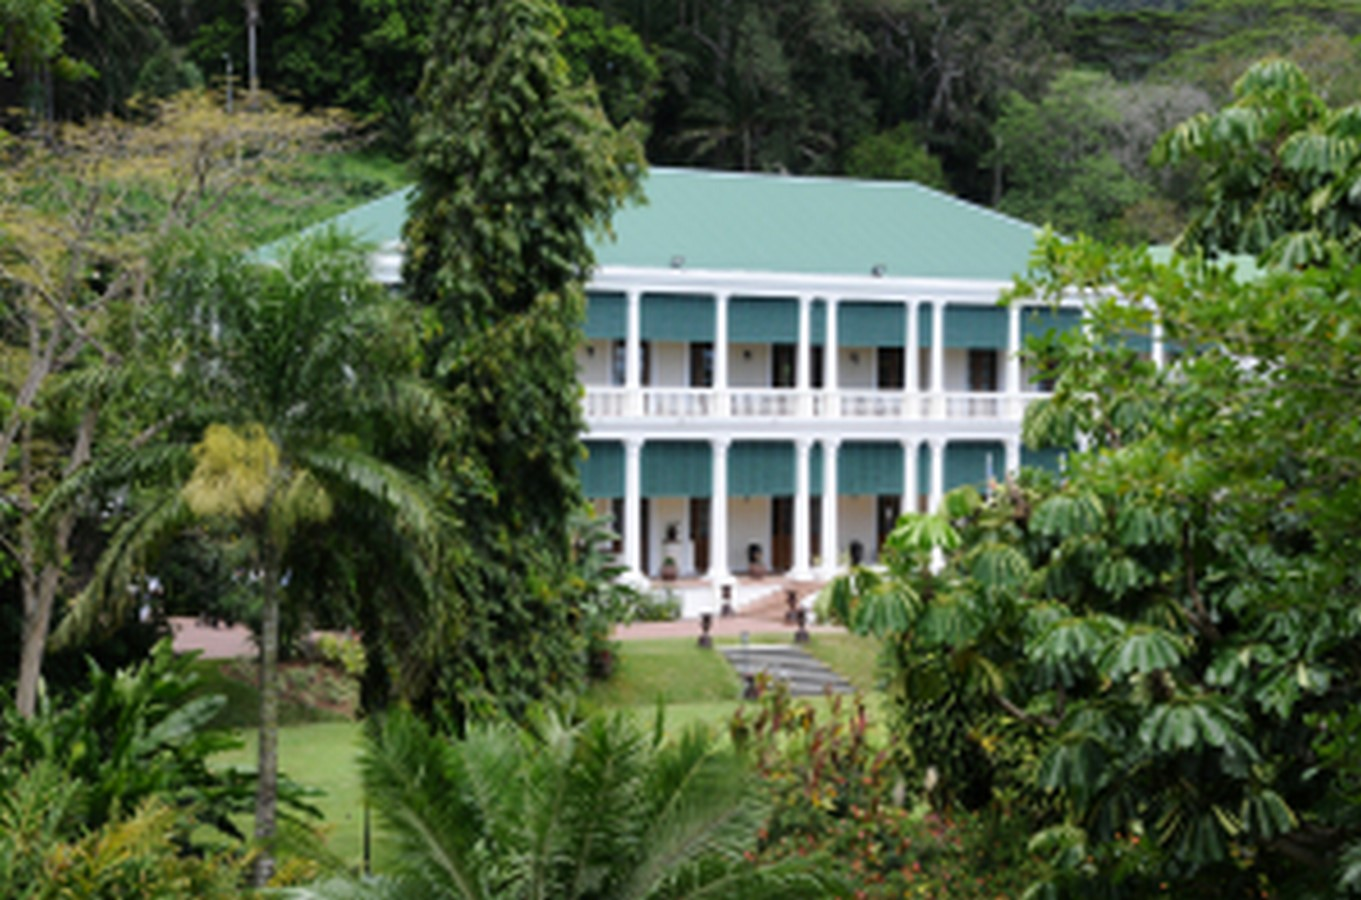 Statehouse, Mahé, Seychelles - Sheet2